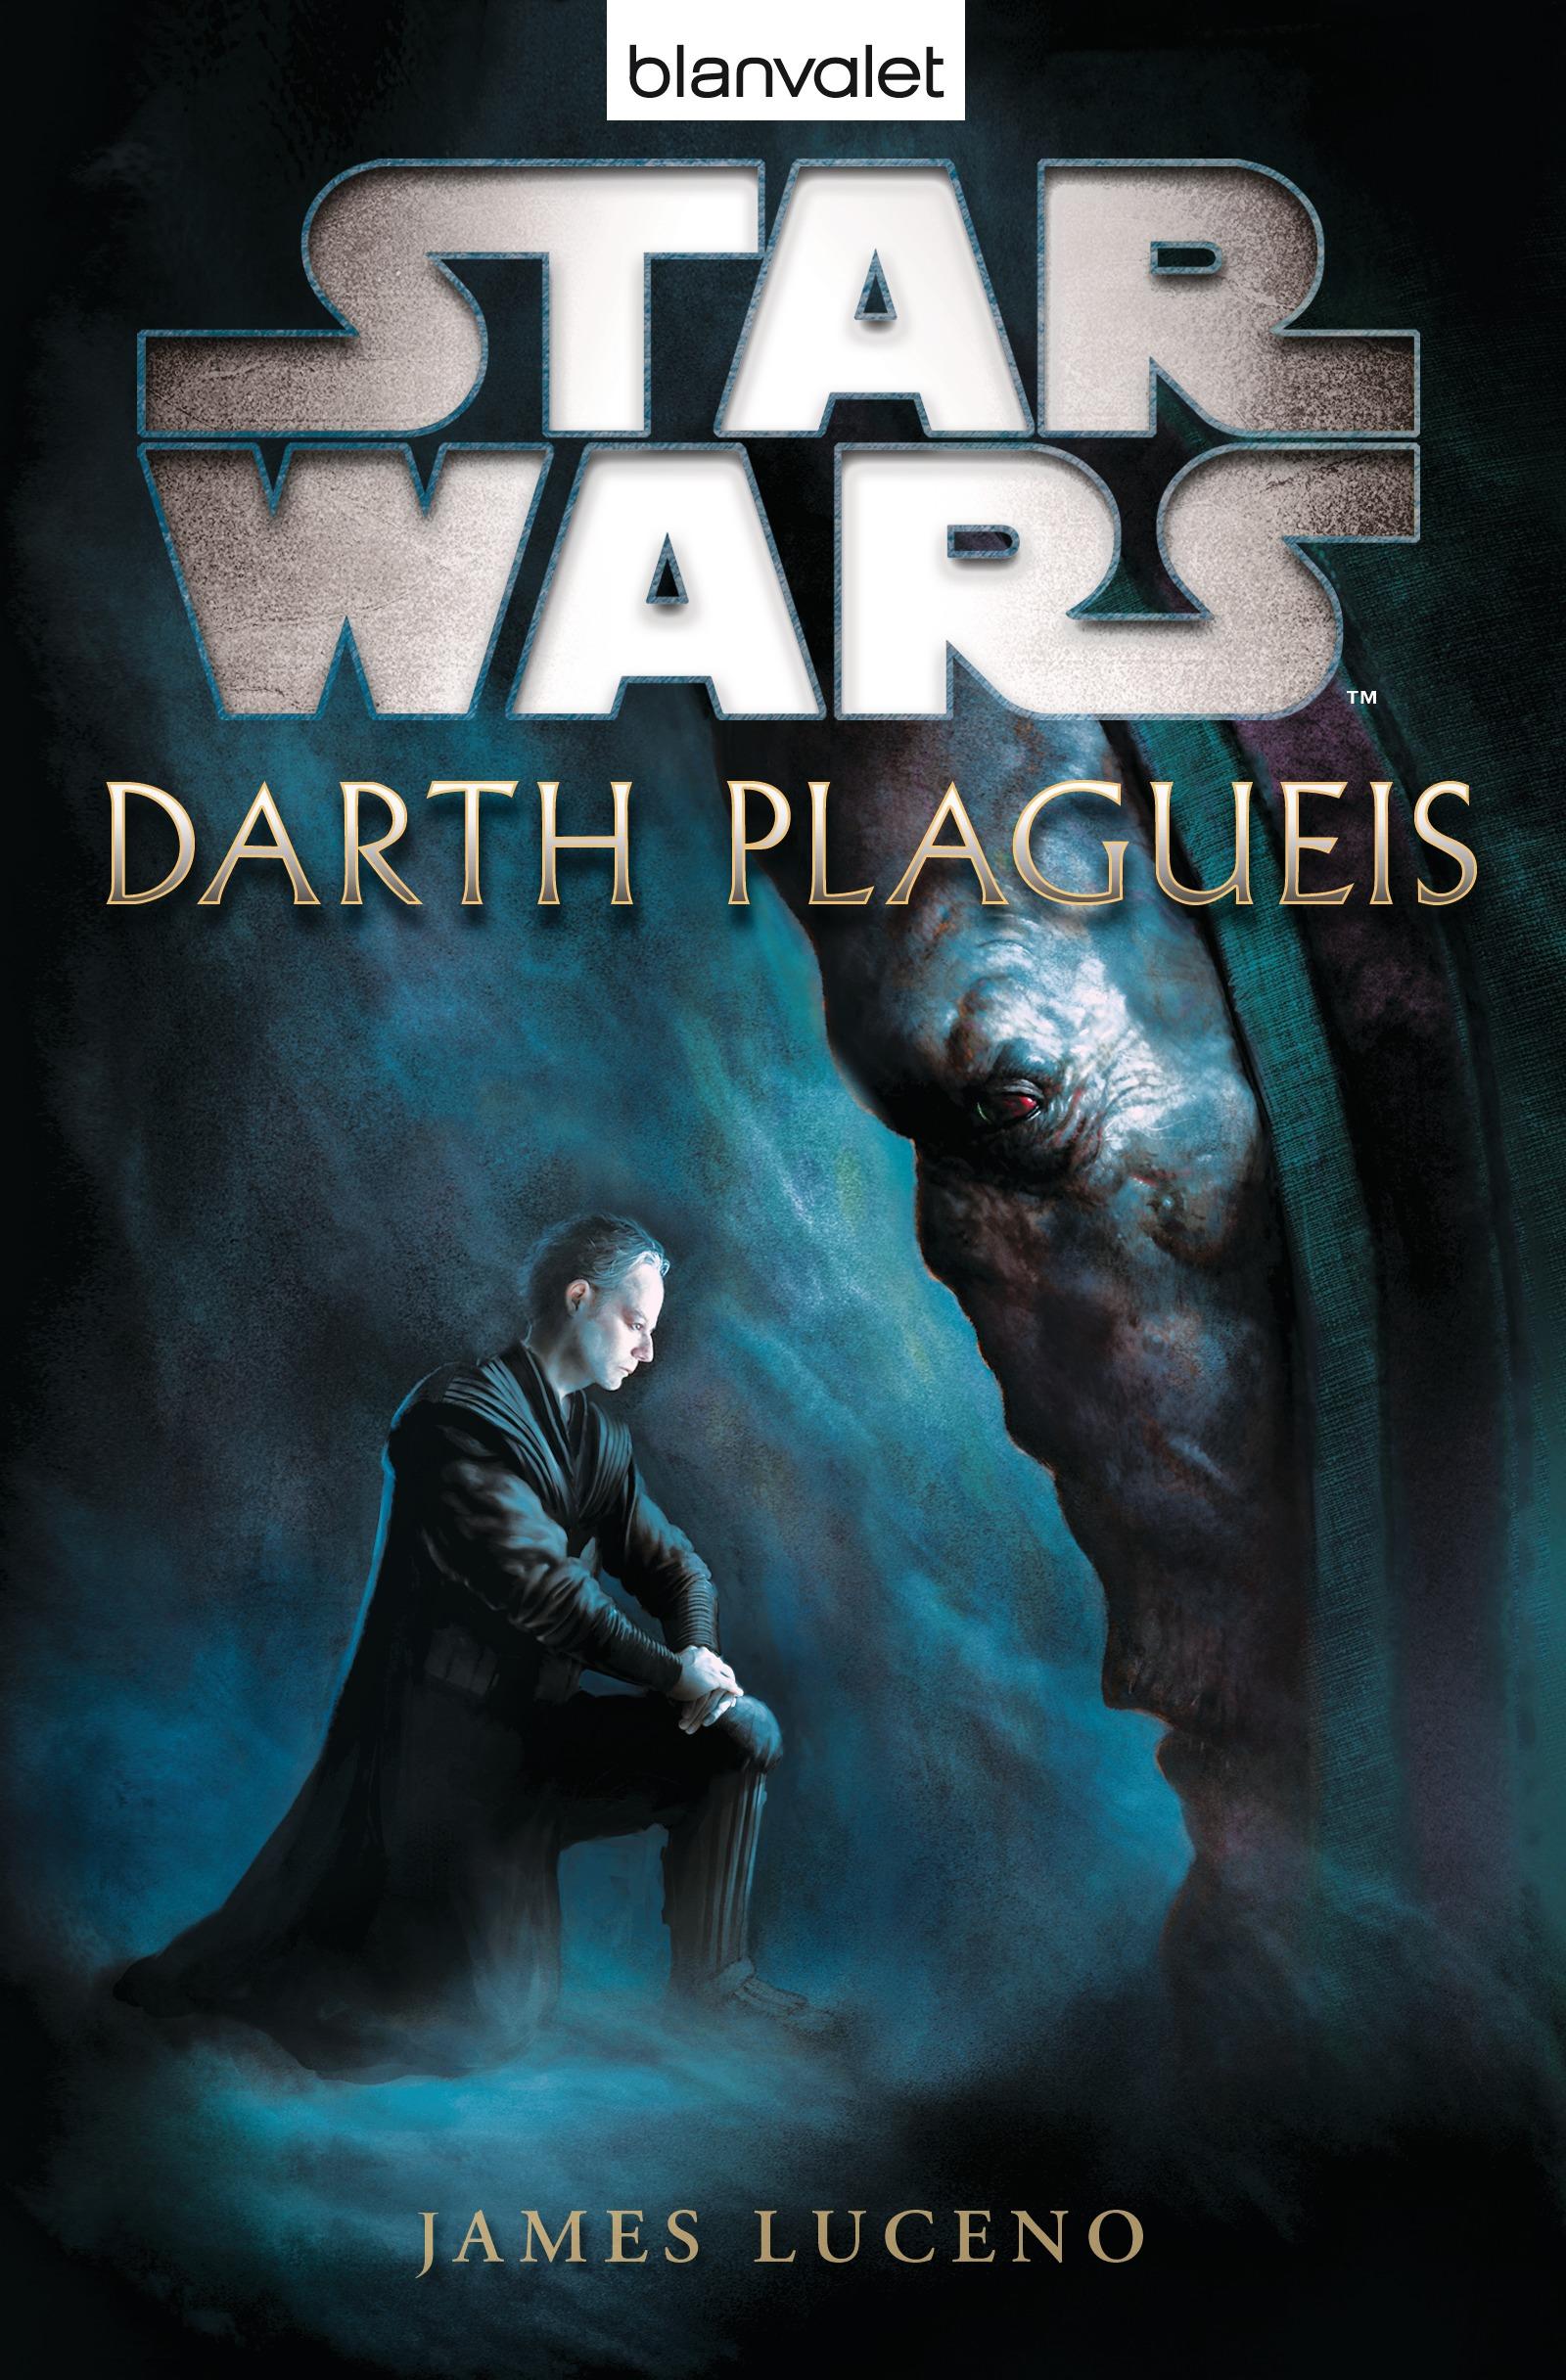 Star Wars(TM) Darth Plagueis - James Luceno